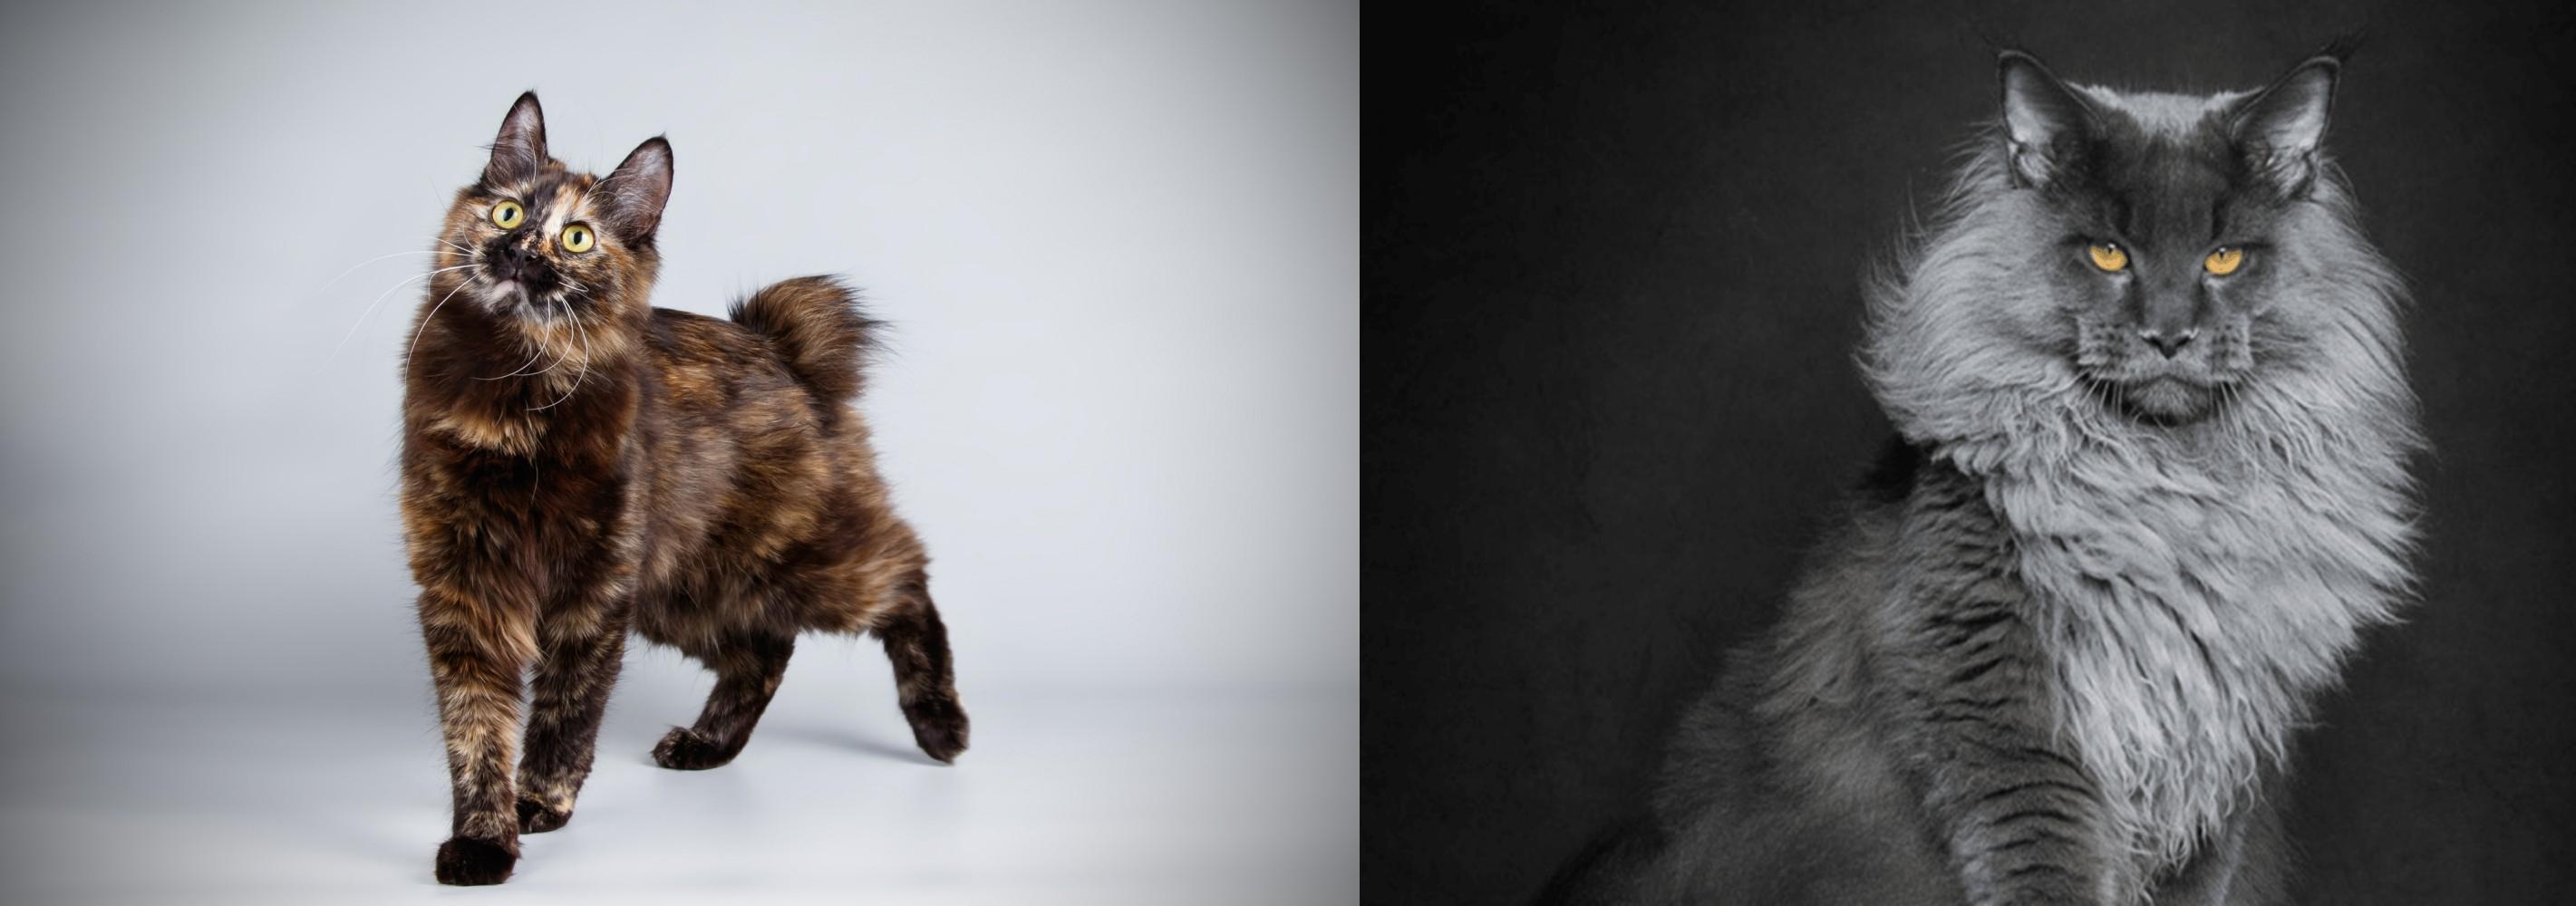 Maine Coon vs Japanese Bobtail - Breed Comparison